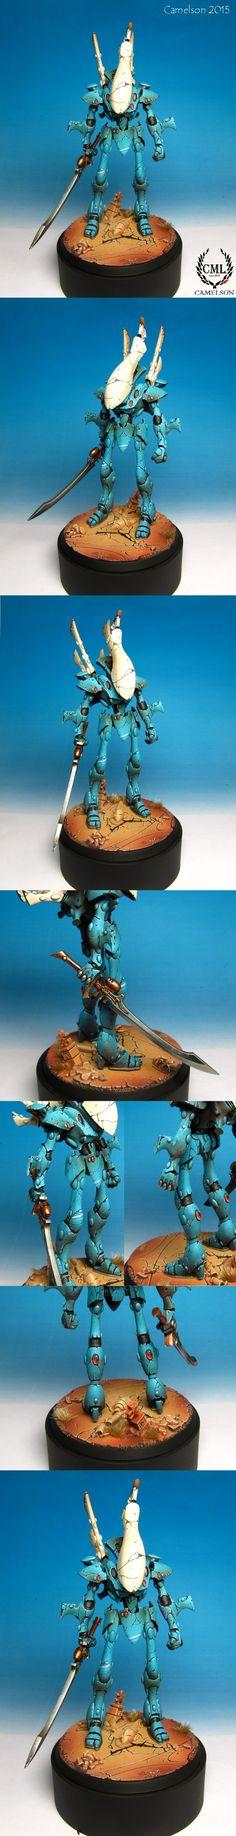 40k - Eldar Wraithlord by camelson